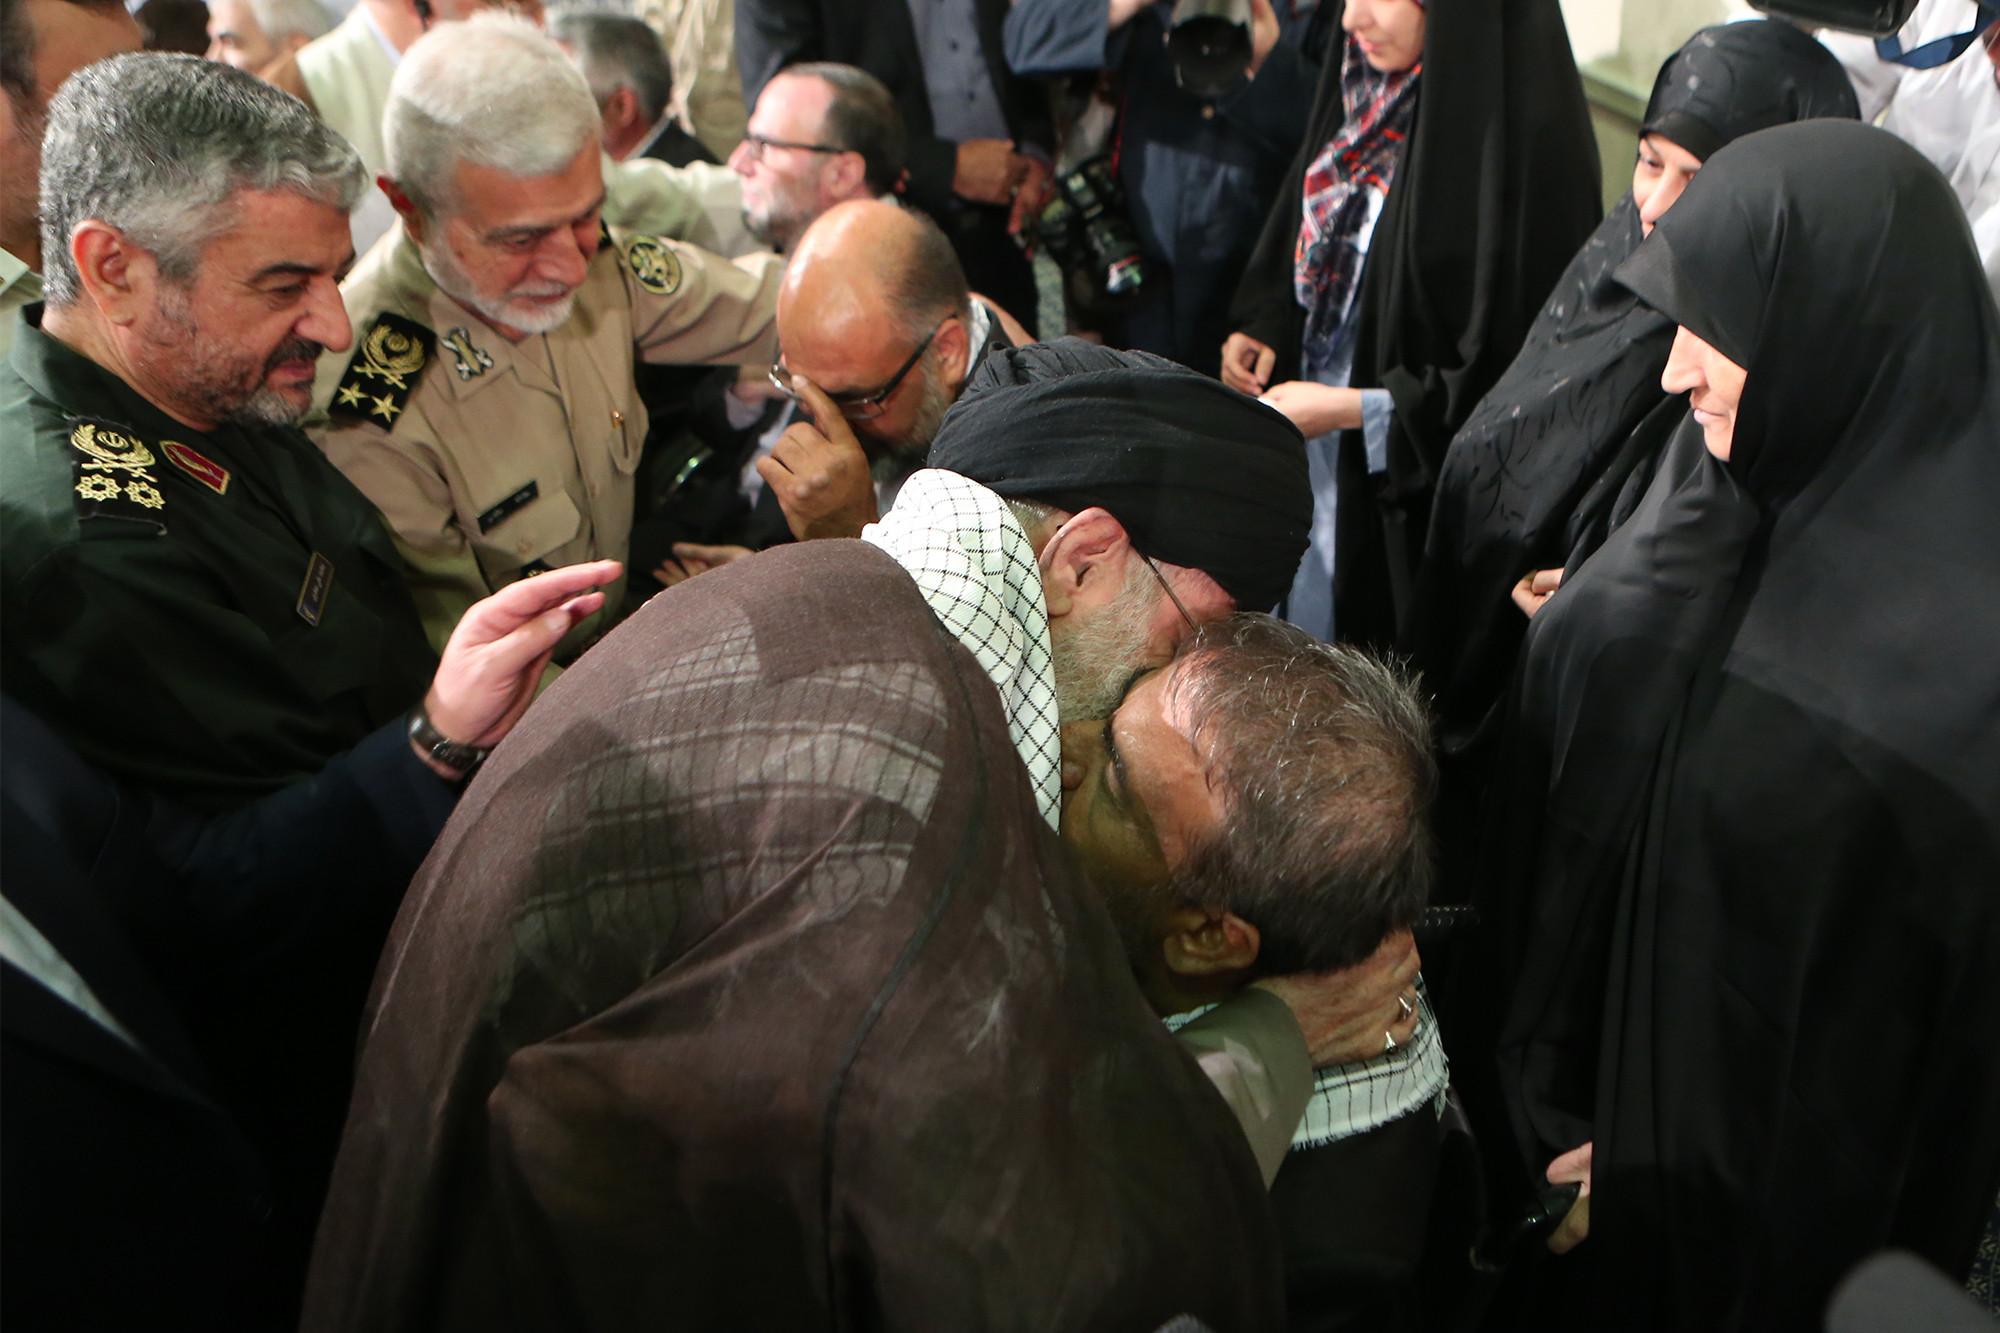 Image result for بیانات بیانات در دیدار جمعی از ایثارگران و خانوادههای شهدا سال 81